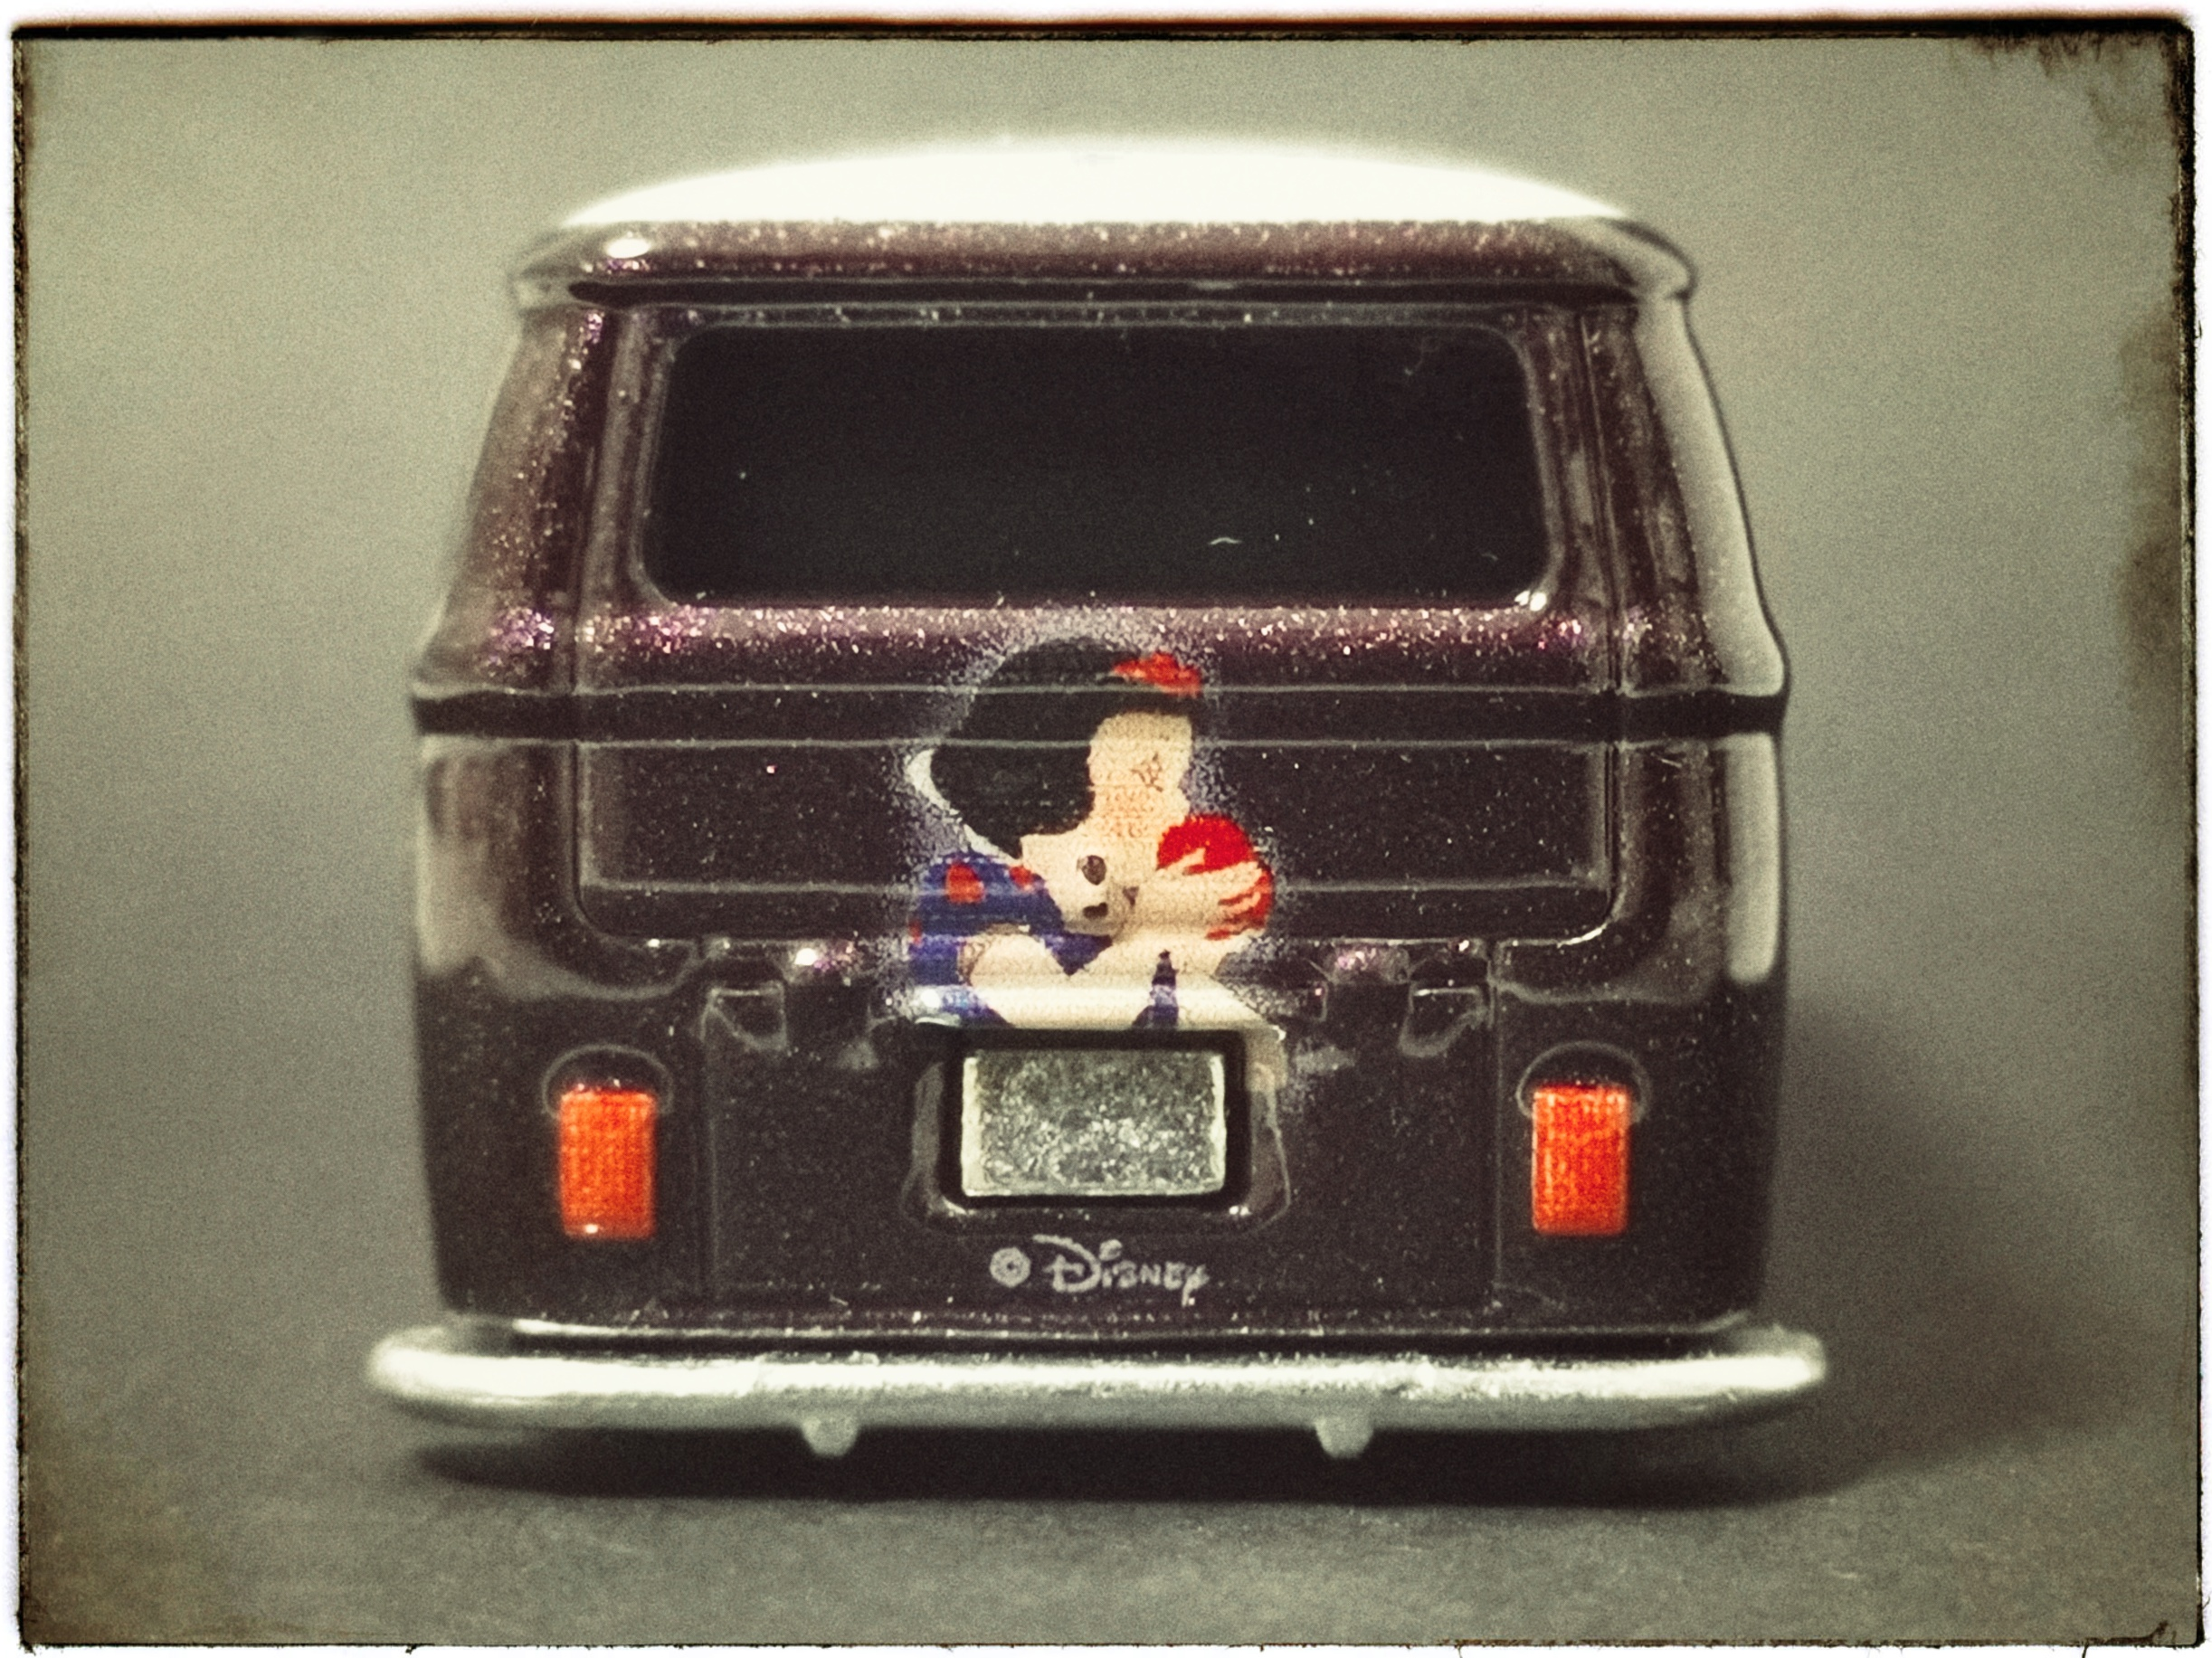 Hot Wheels Volkswagen T1 Panel Bus (FKY34) 2018 Pop Culture: Disney Snow White (1/5) metallic purple VW back